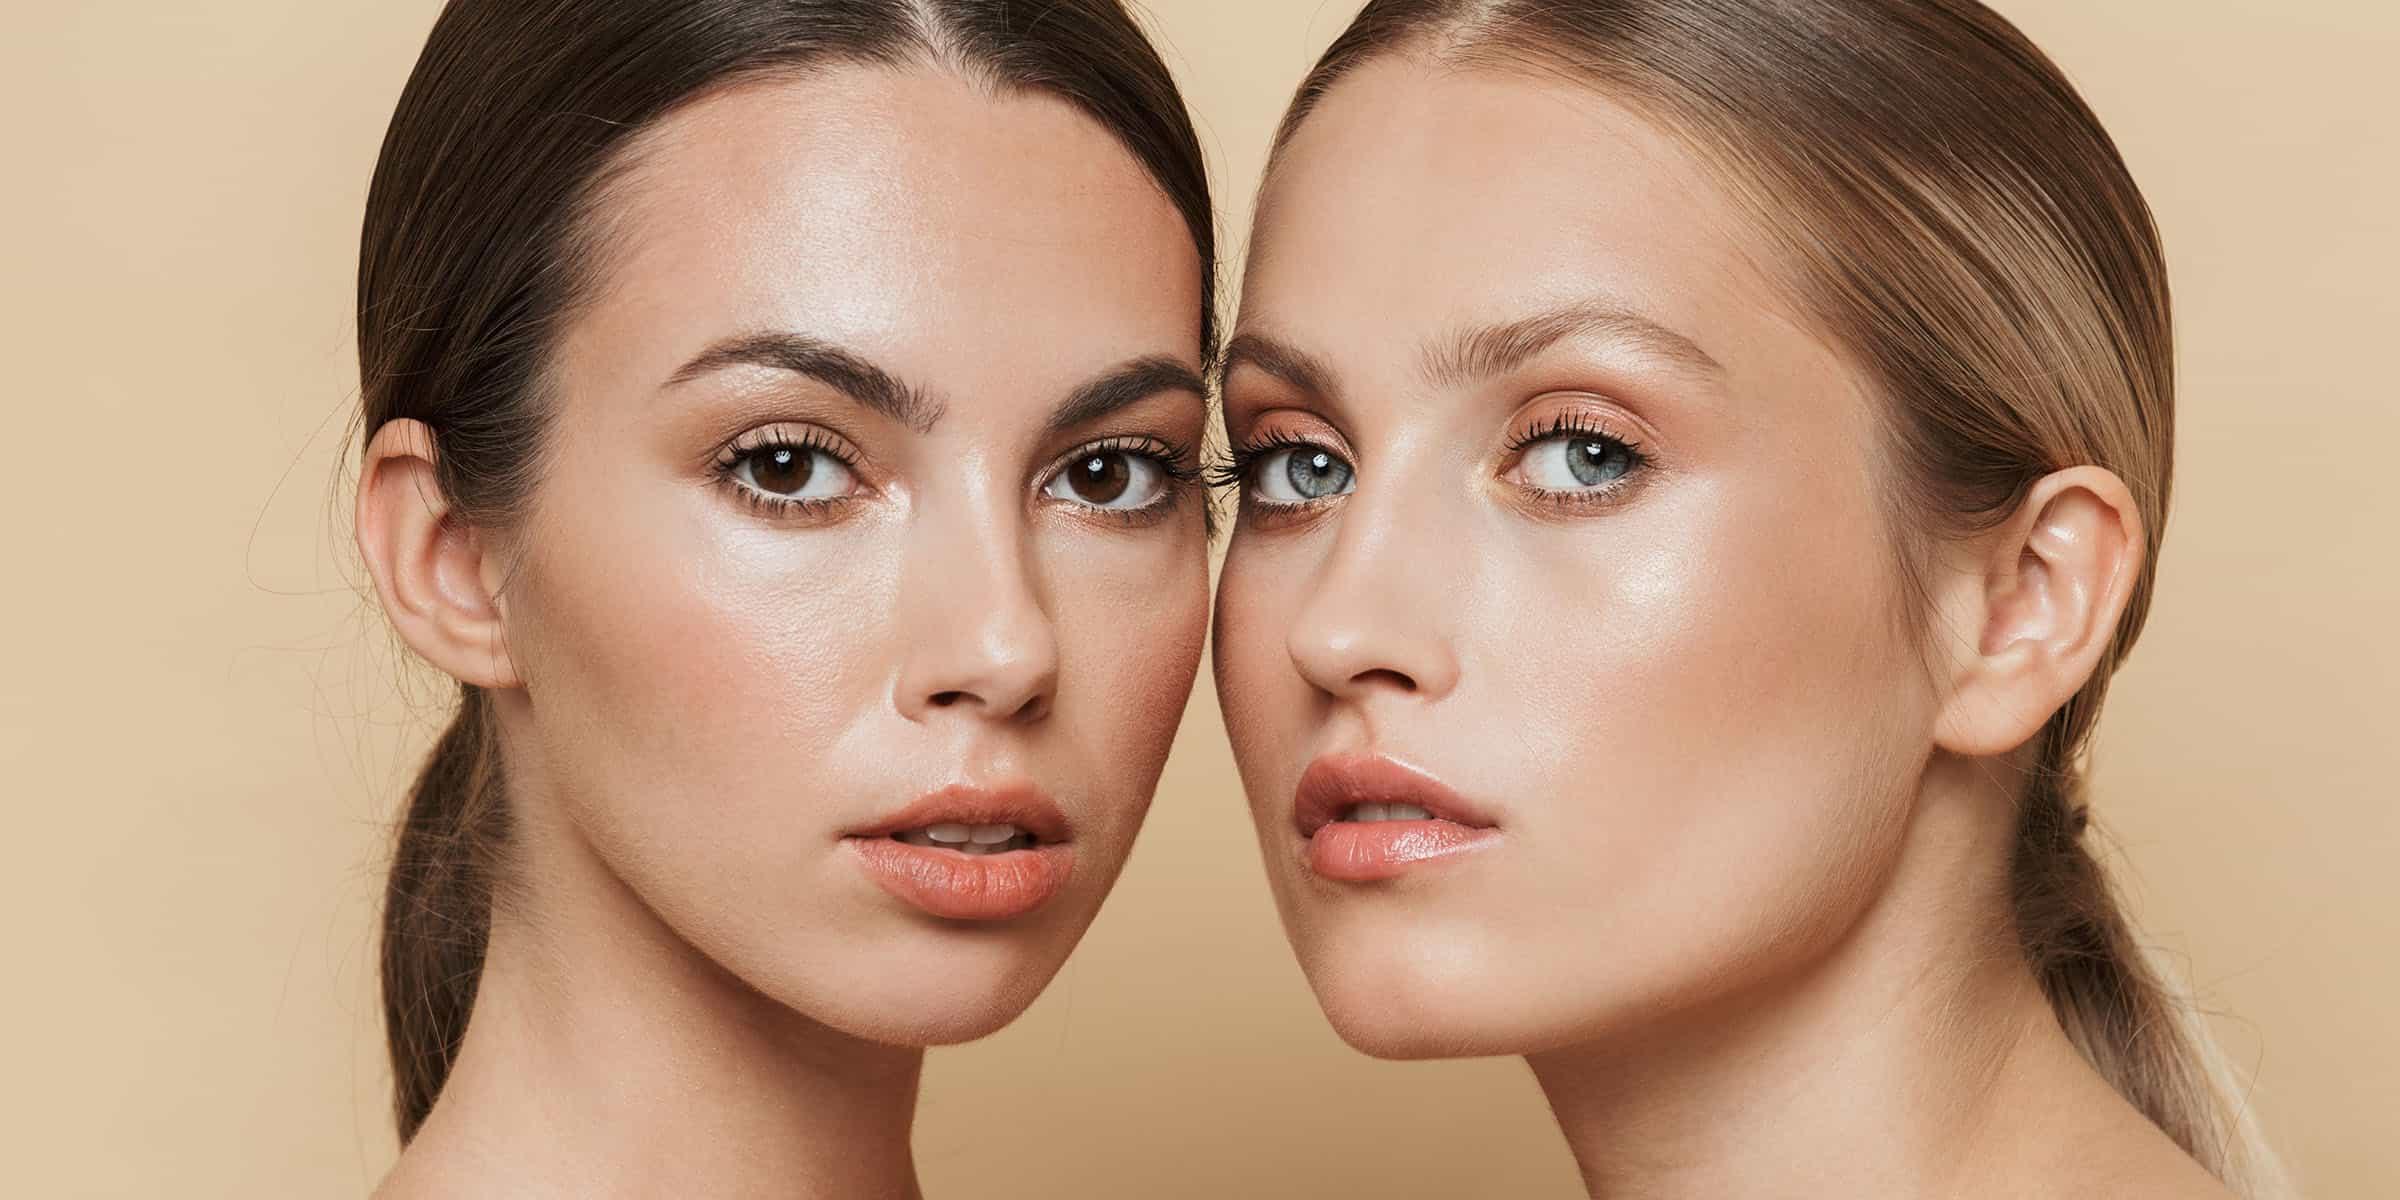 acne treatment los angeles